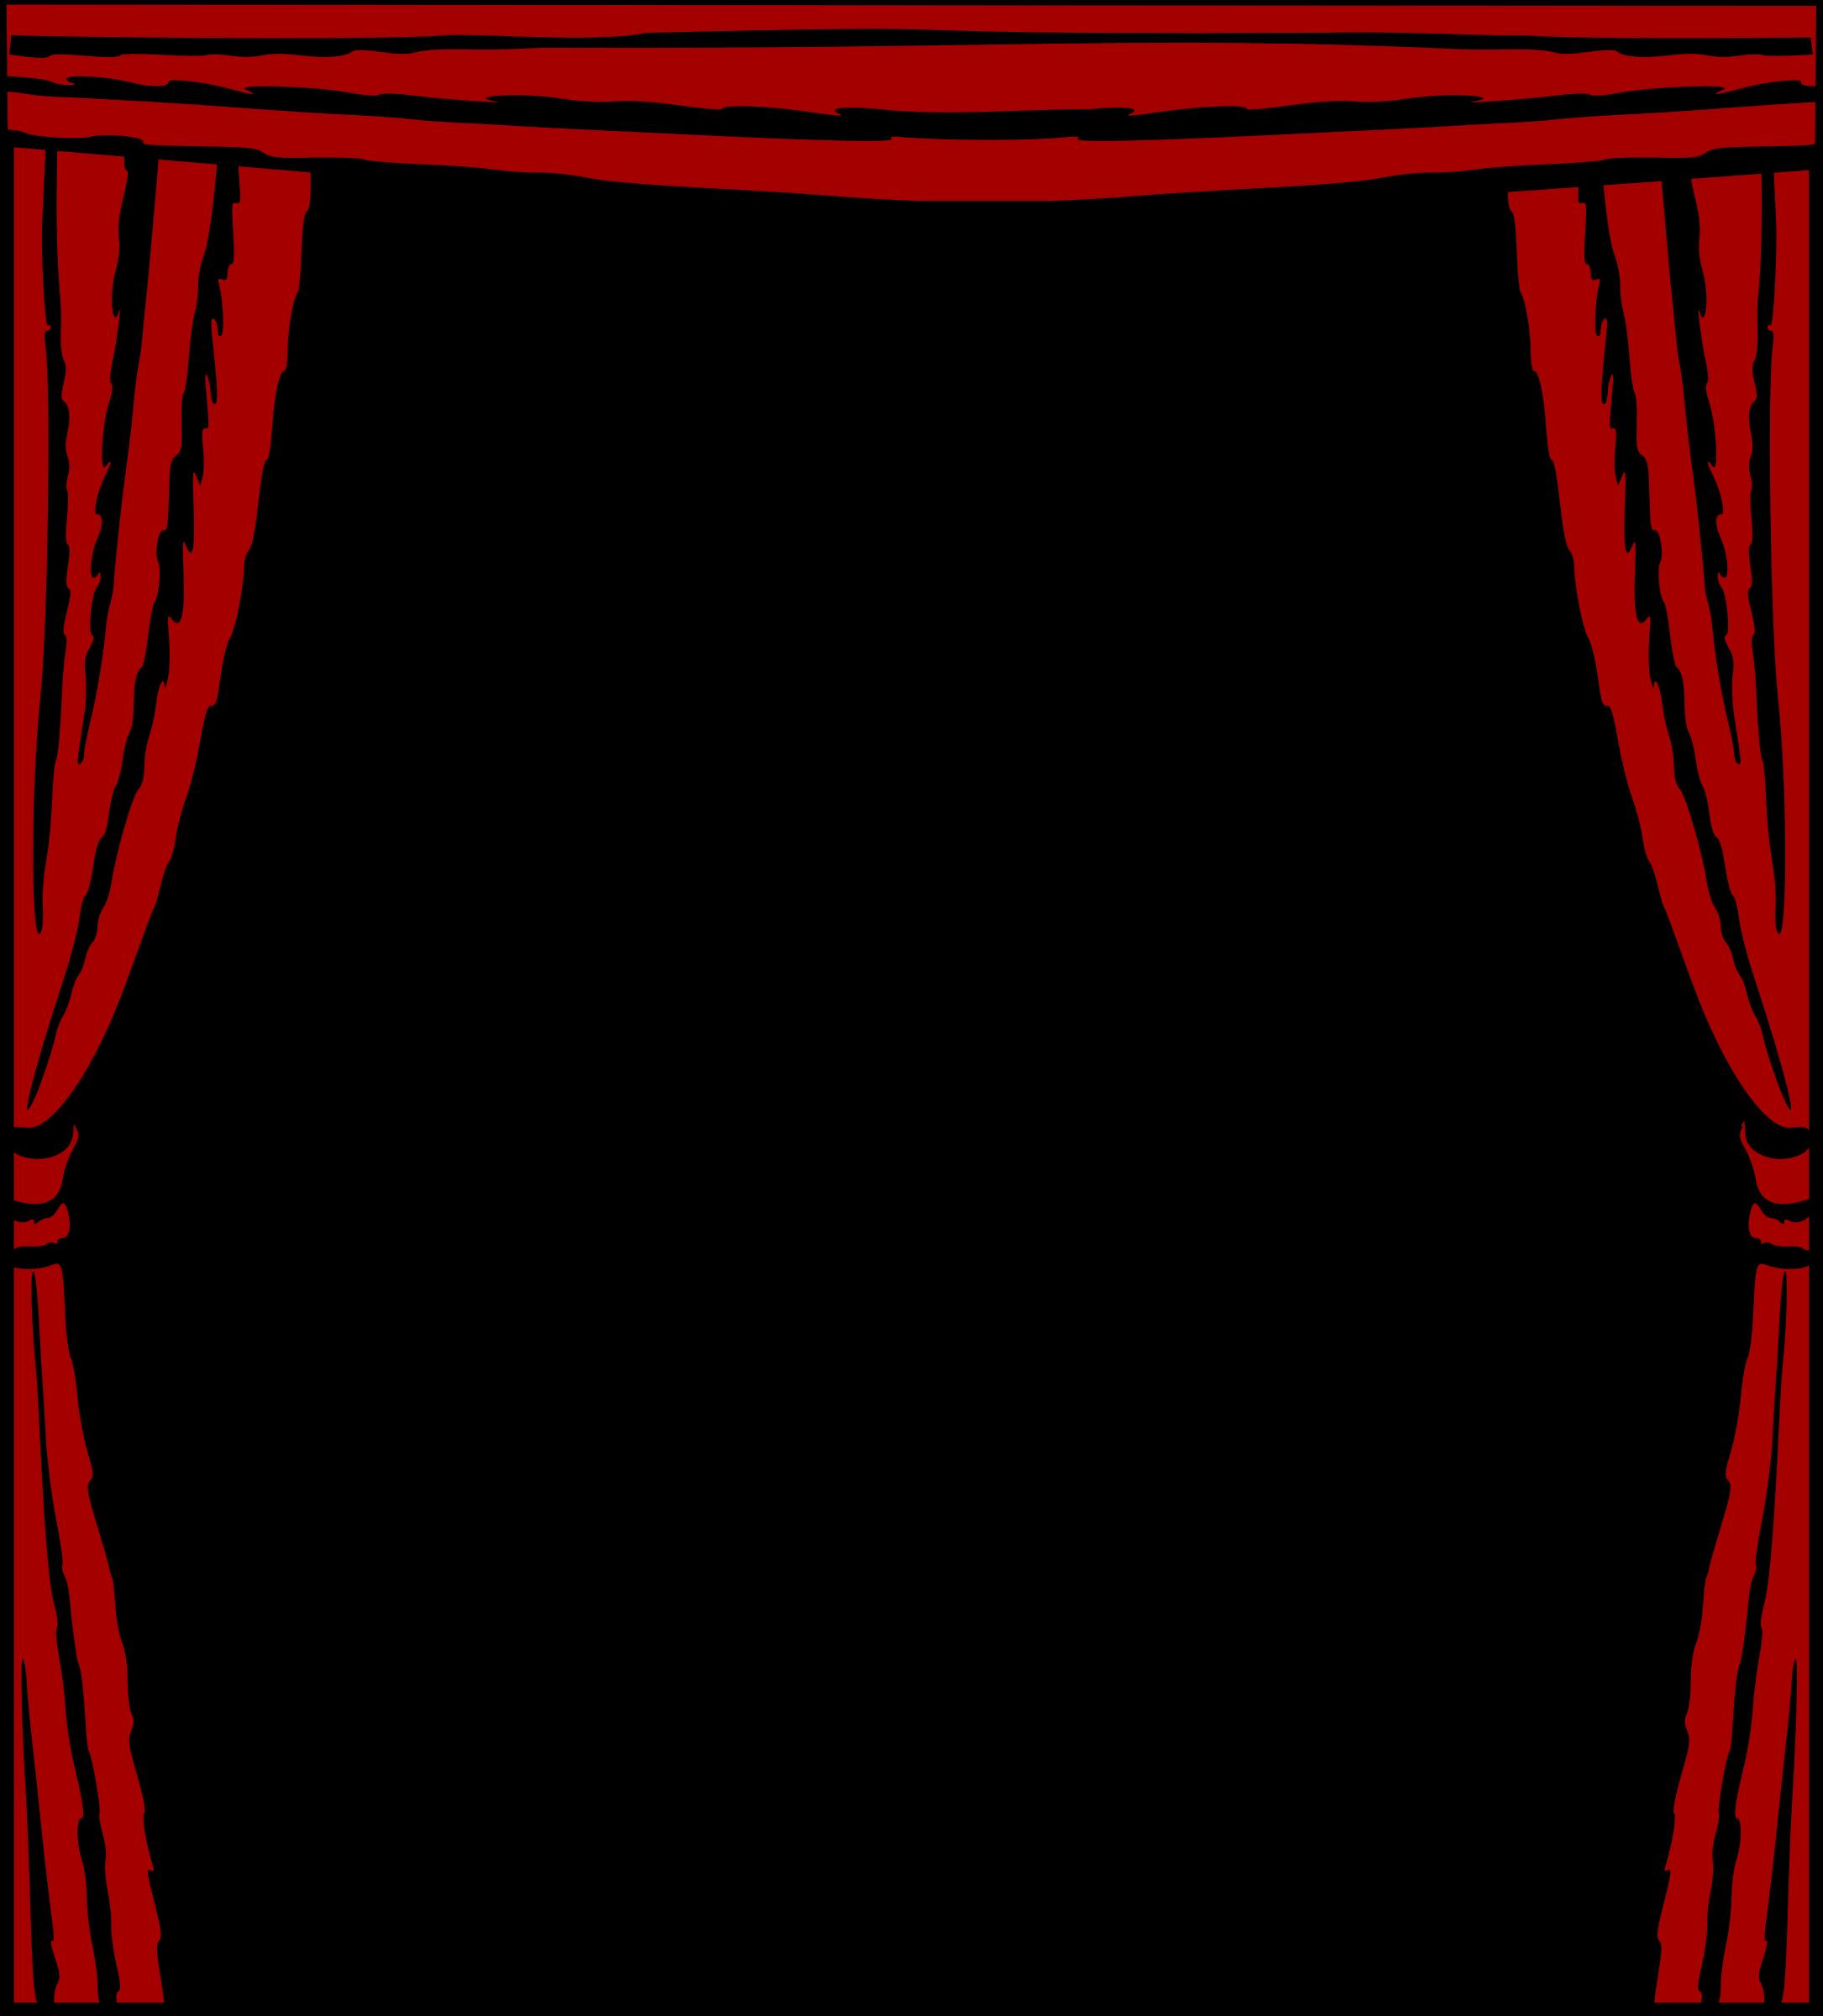 Curtains clipart clip art, Curtains clip art Transparent.